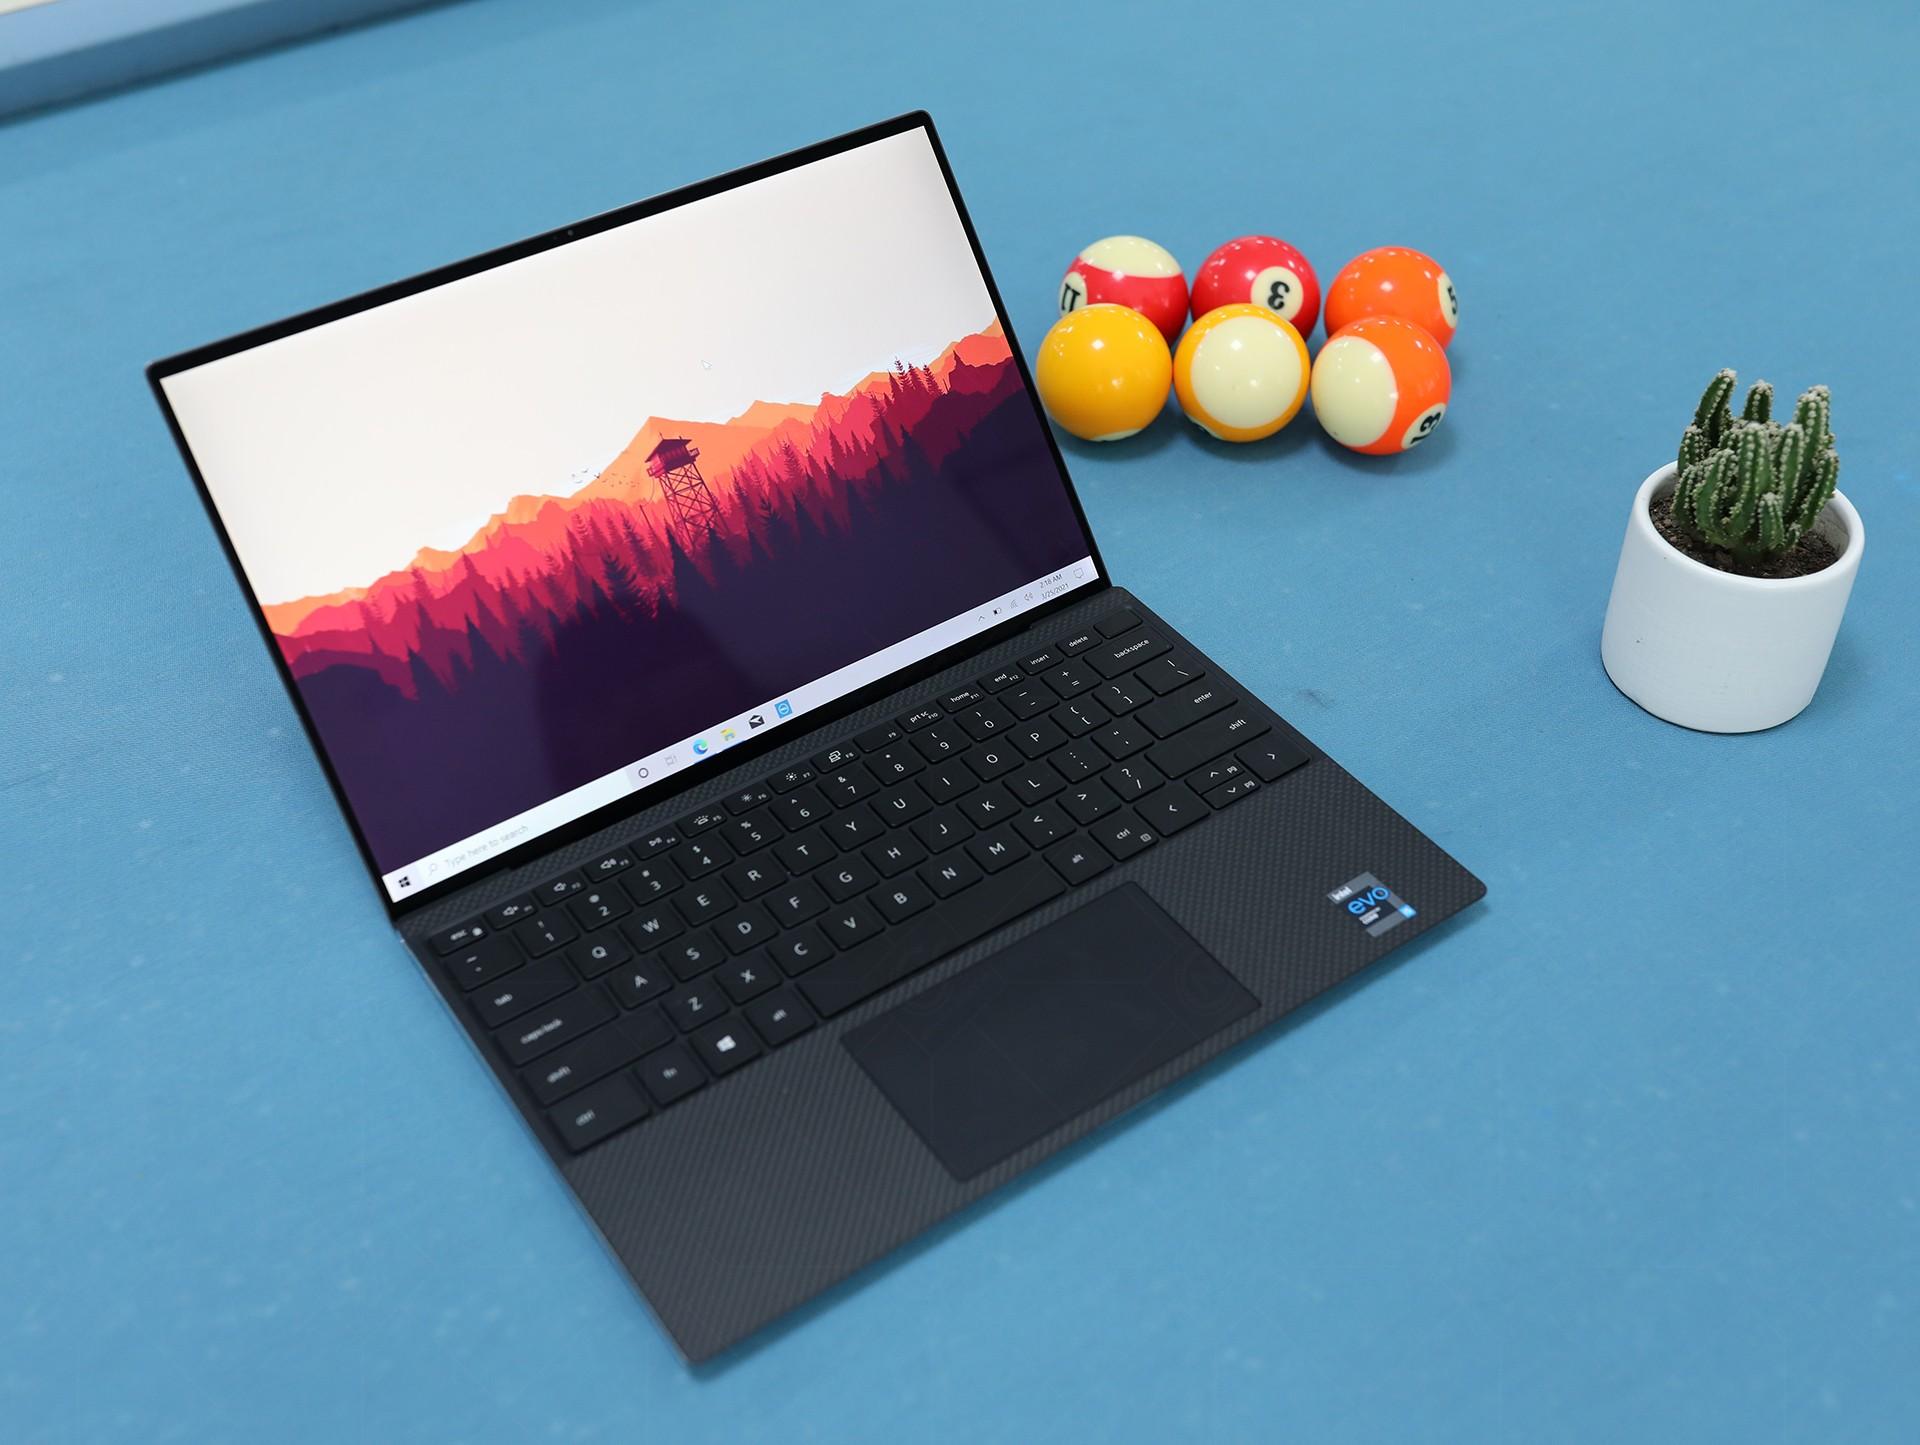 laptop-dell-xps-13-9310-6.JPG